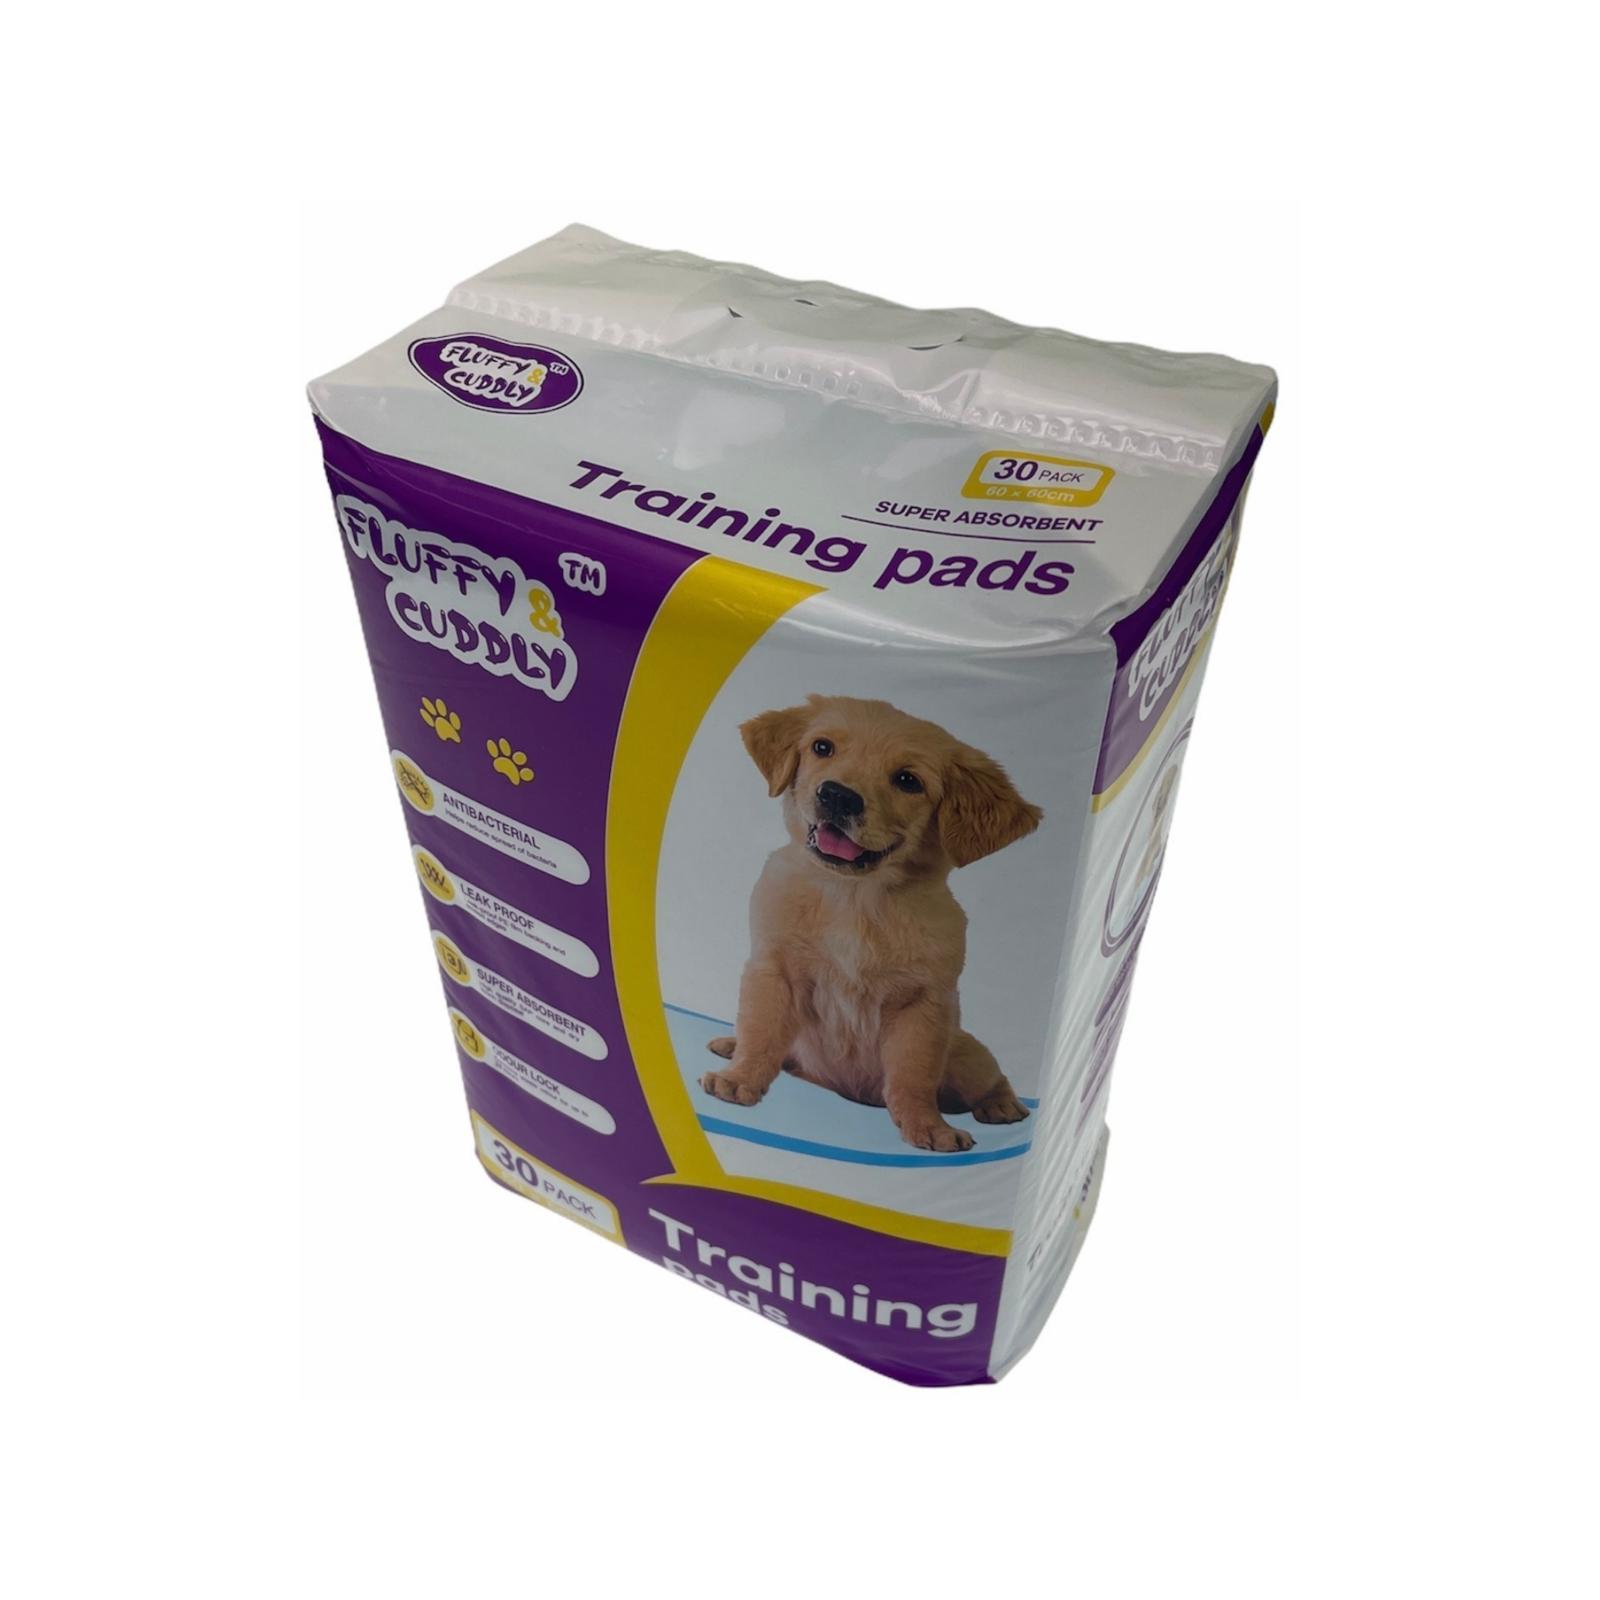 30 Puppy Pet Dog Indoor Cat Toilet Training Pads Super Absorbent 60x60cm